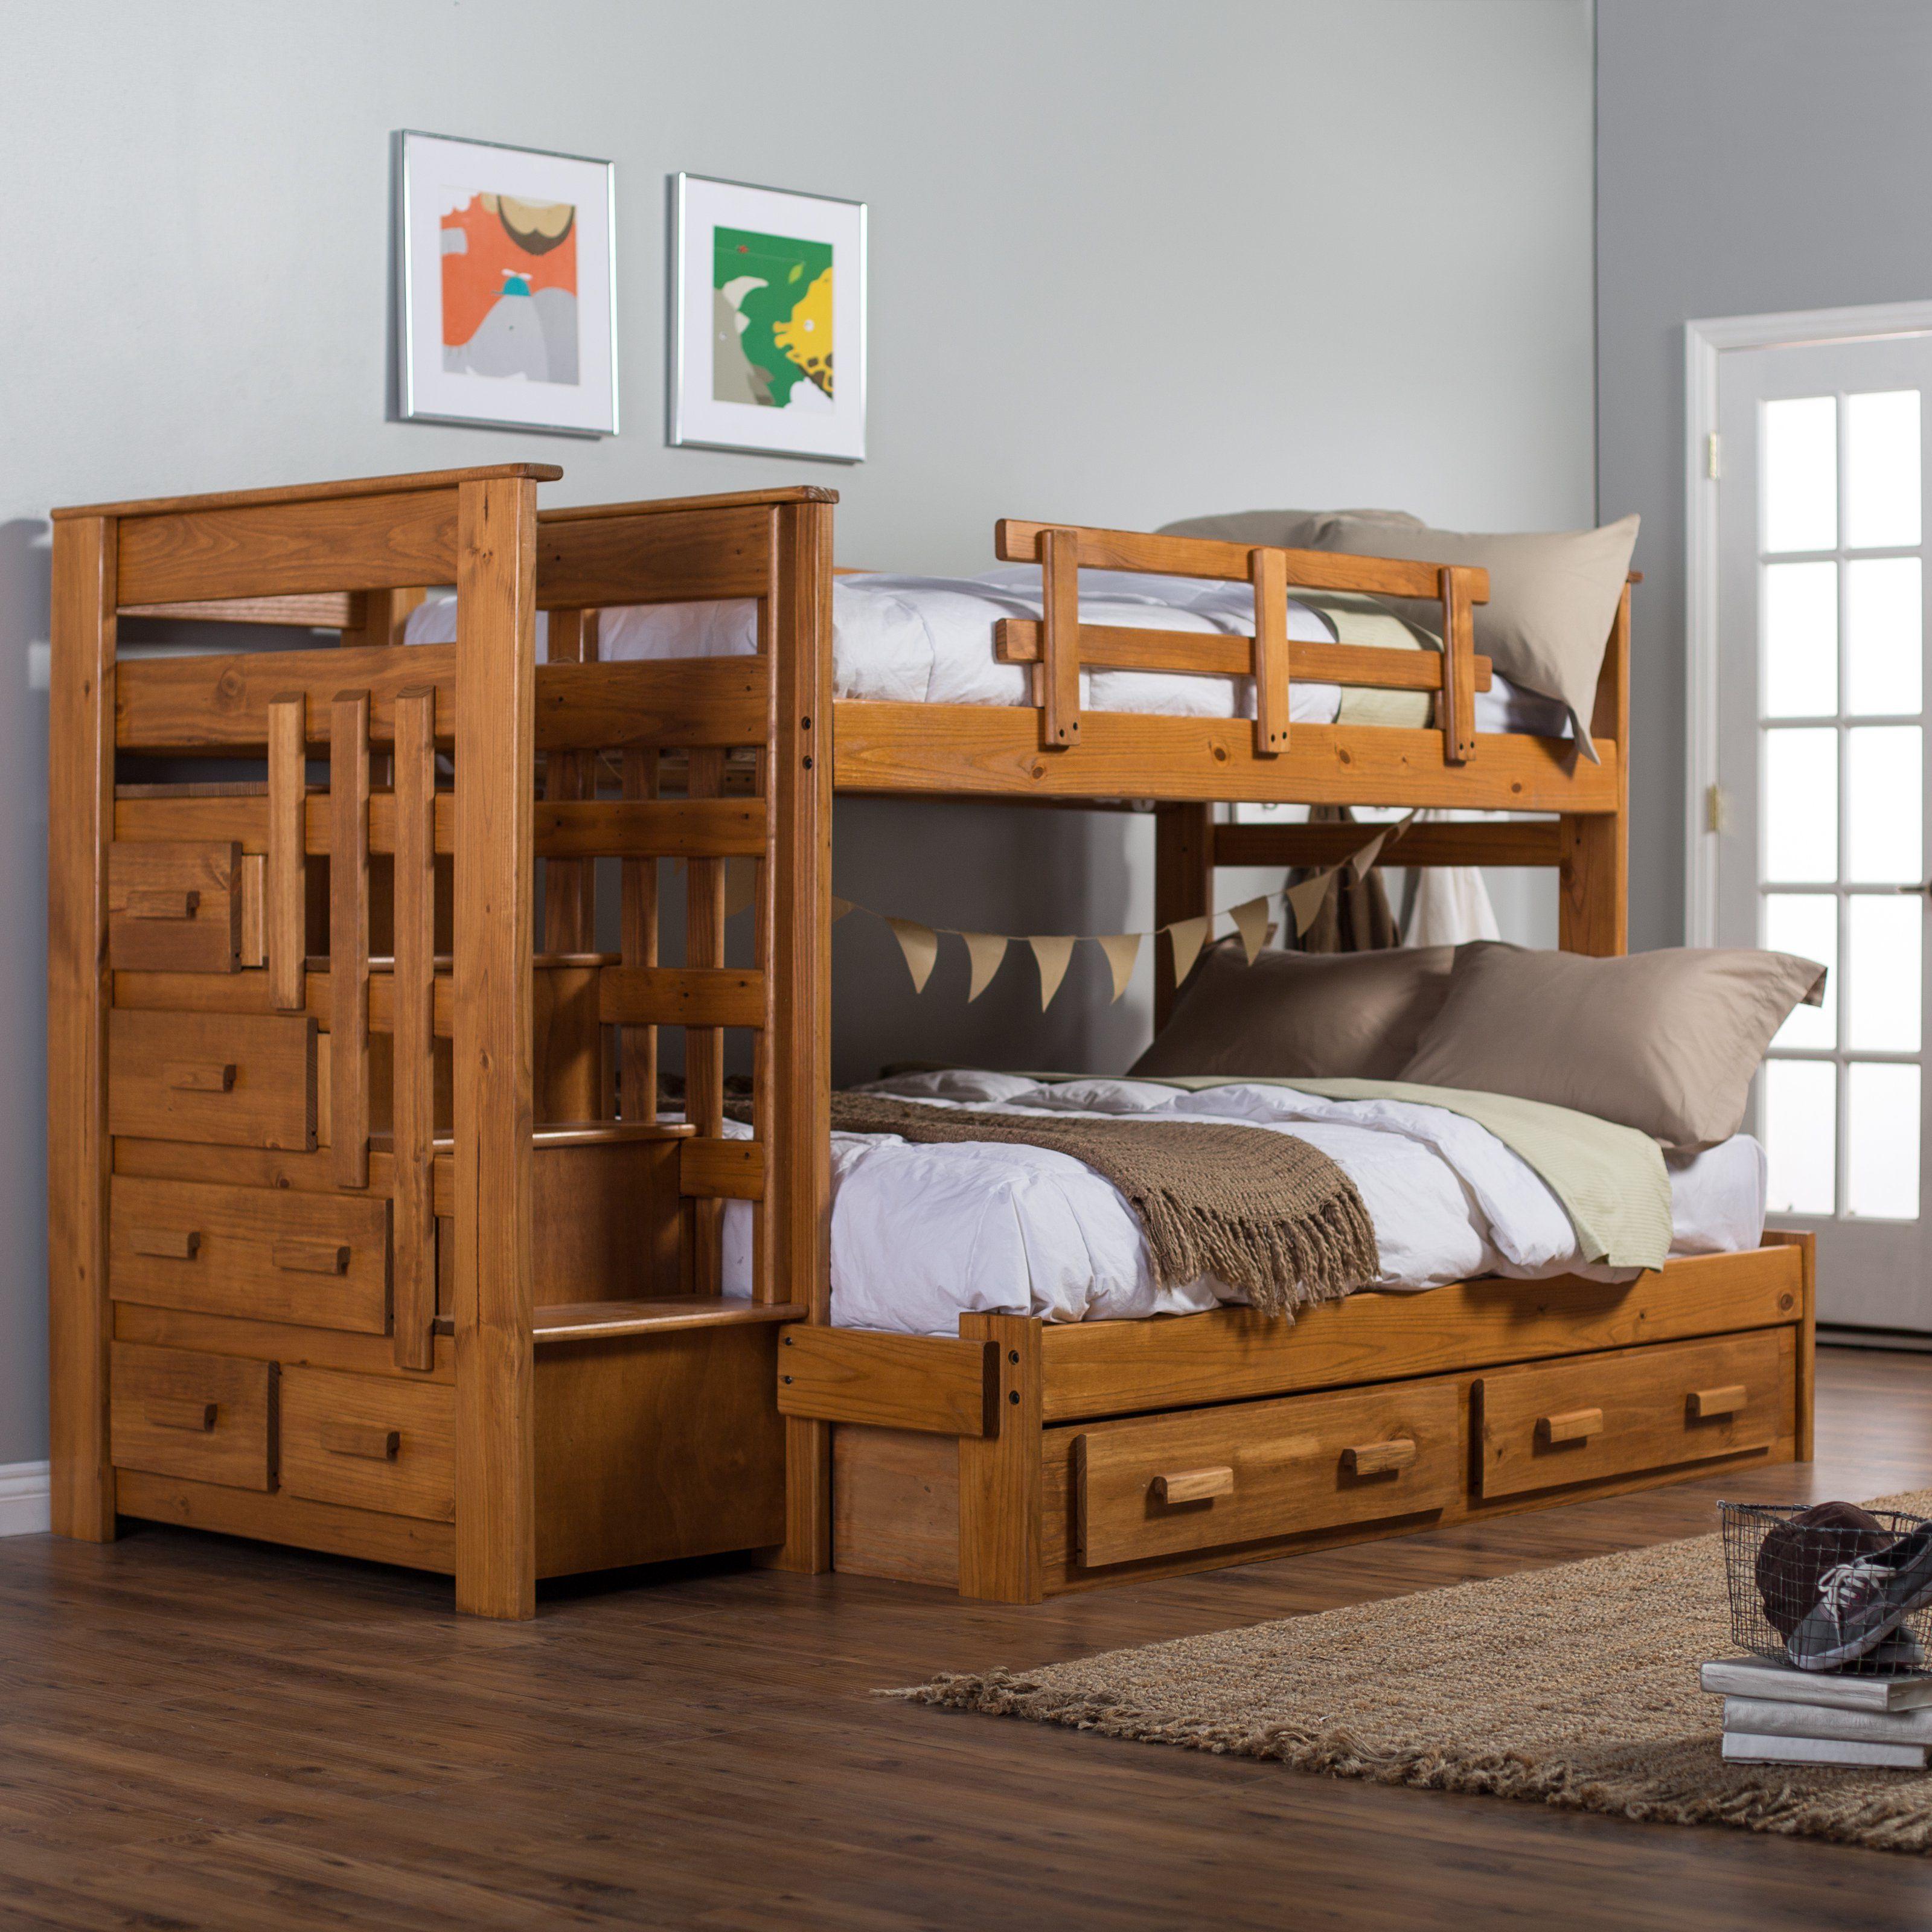 midwest mattress des moines iowa mattress ideas pinterest